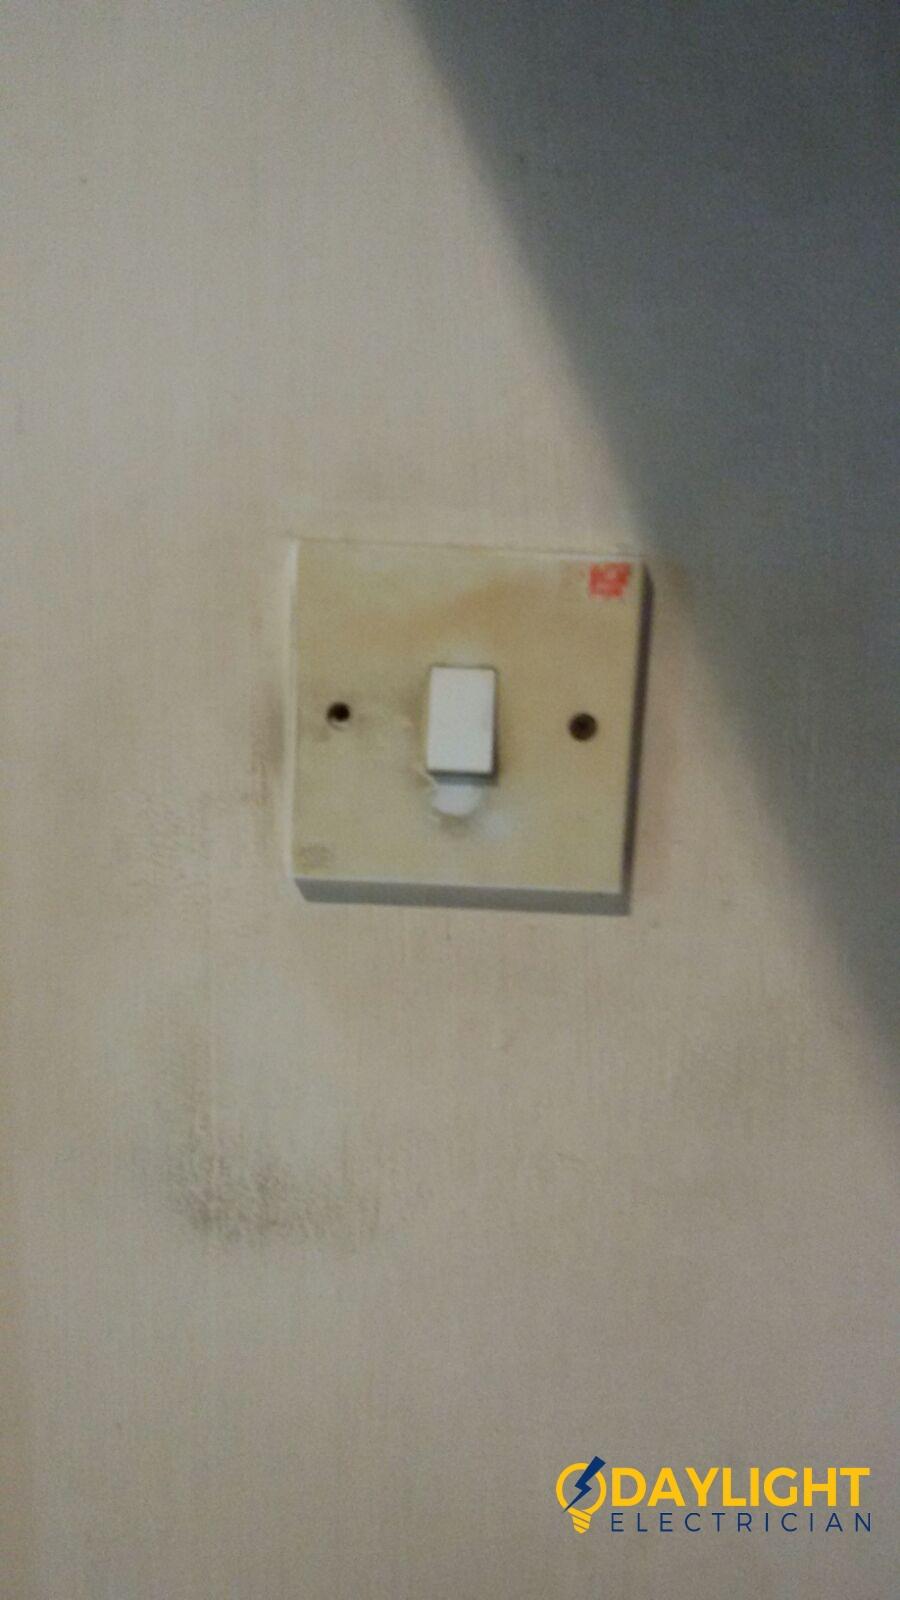 replace-light-switch-electrician-singapore-bedok-hdb-5